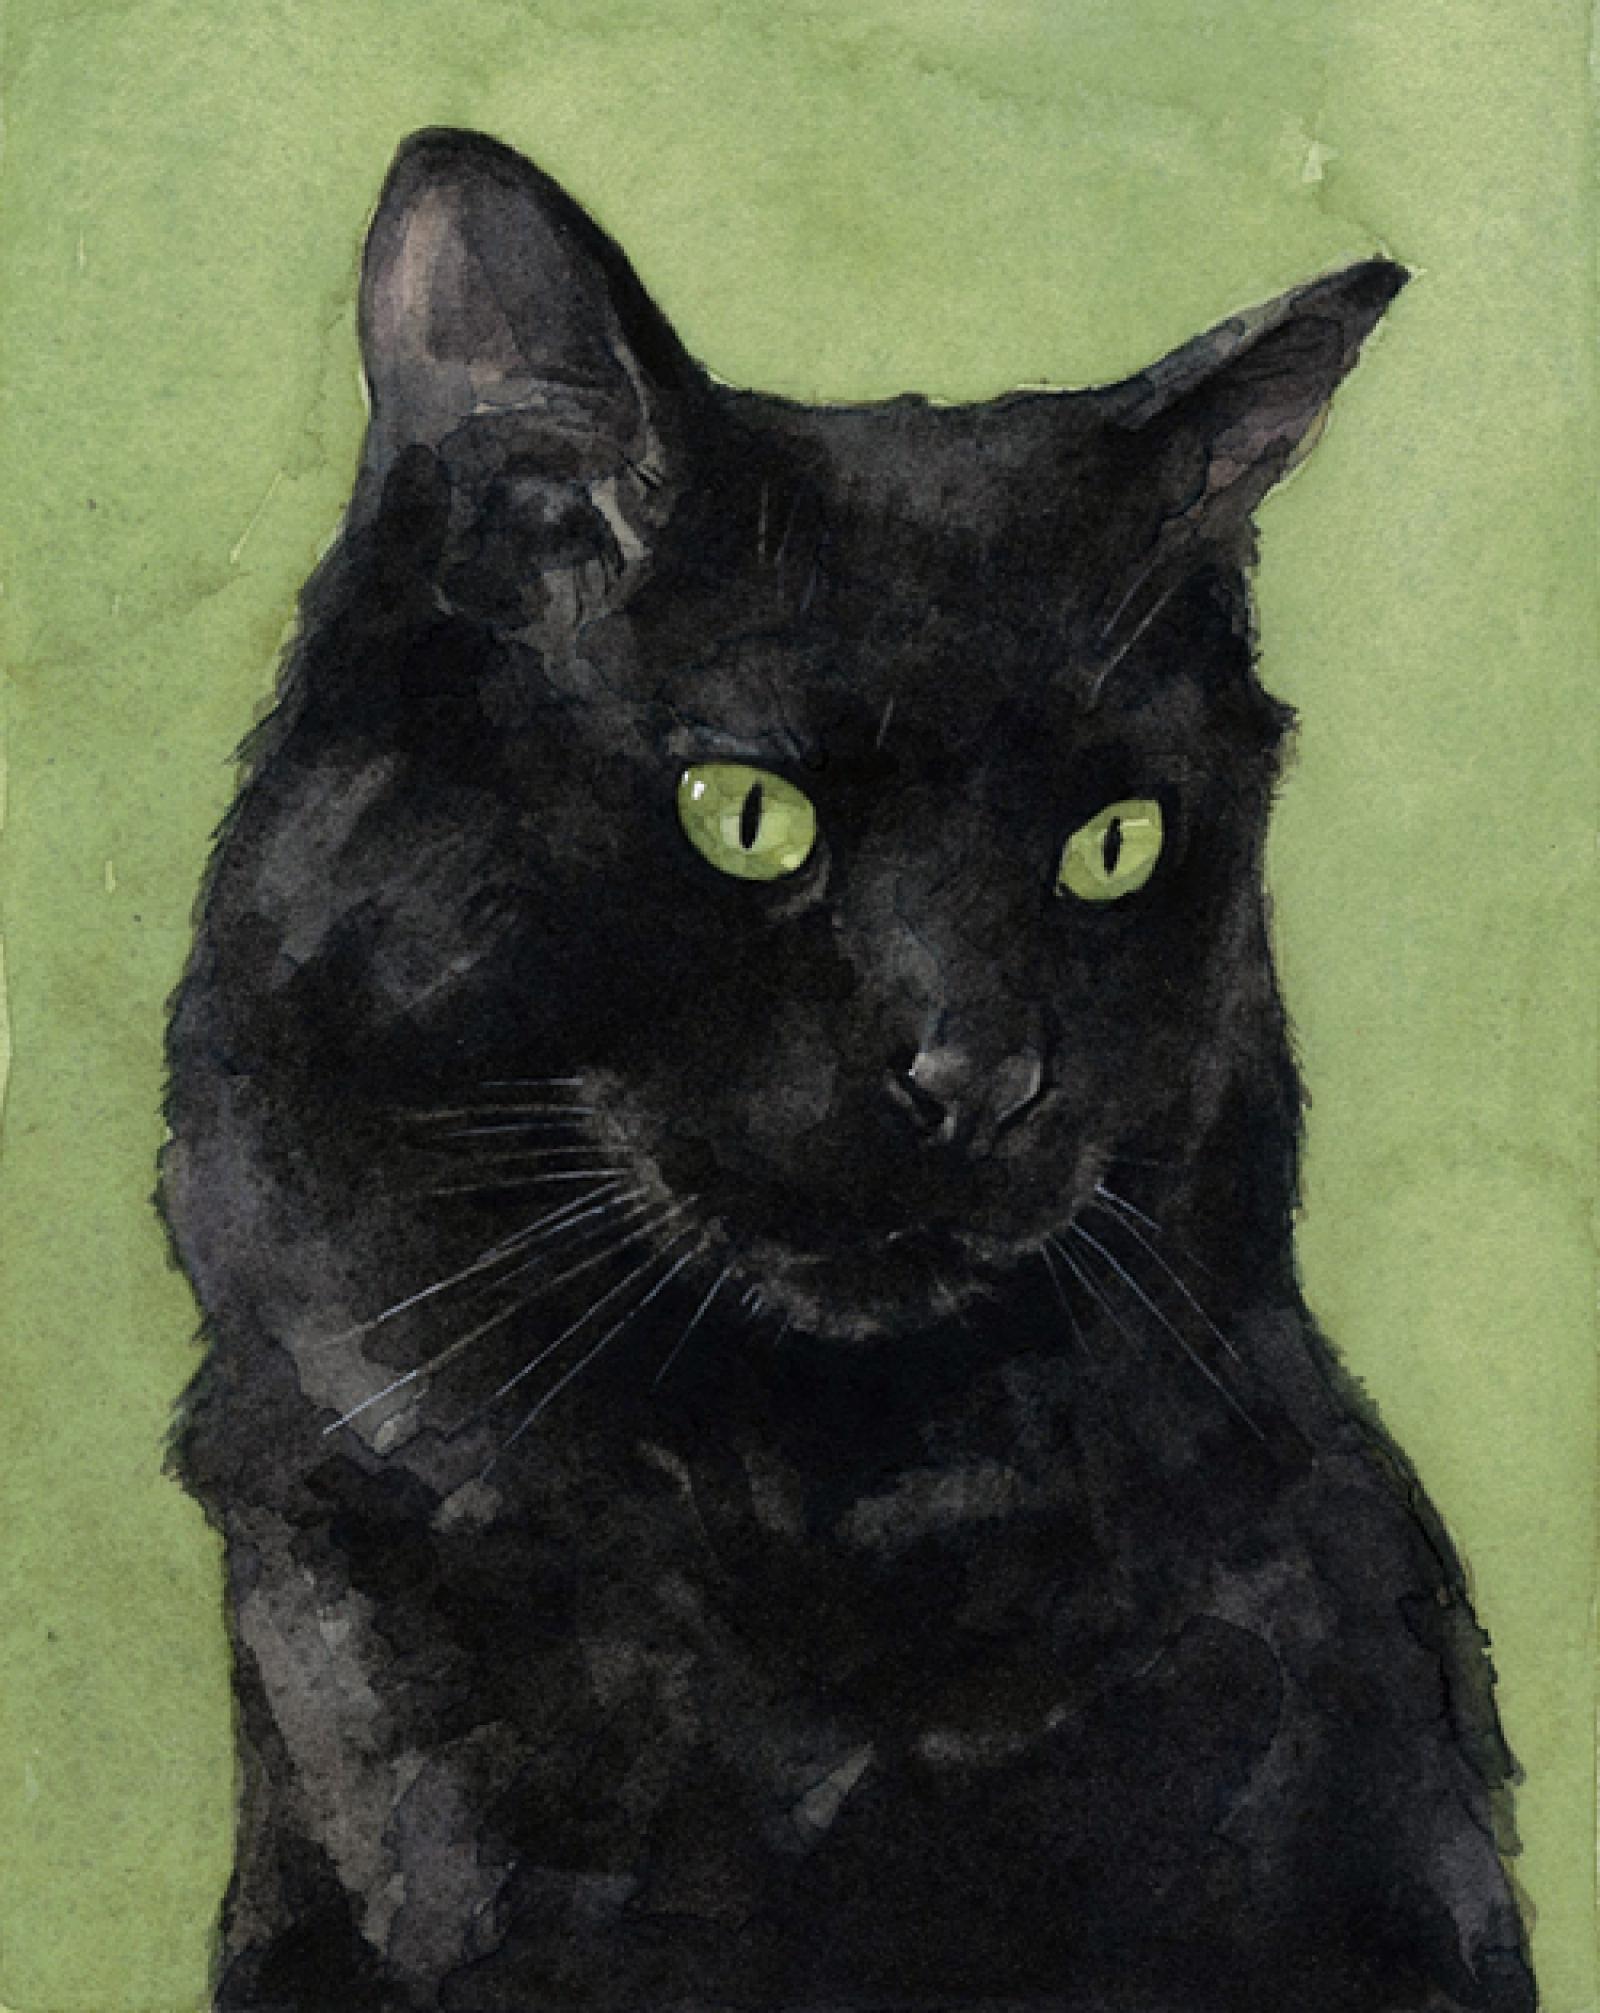 1600x2013 Black Cat Watercolor Print 5x7 David Scheirer Watercolors